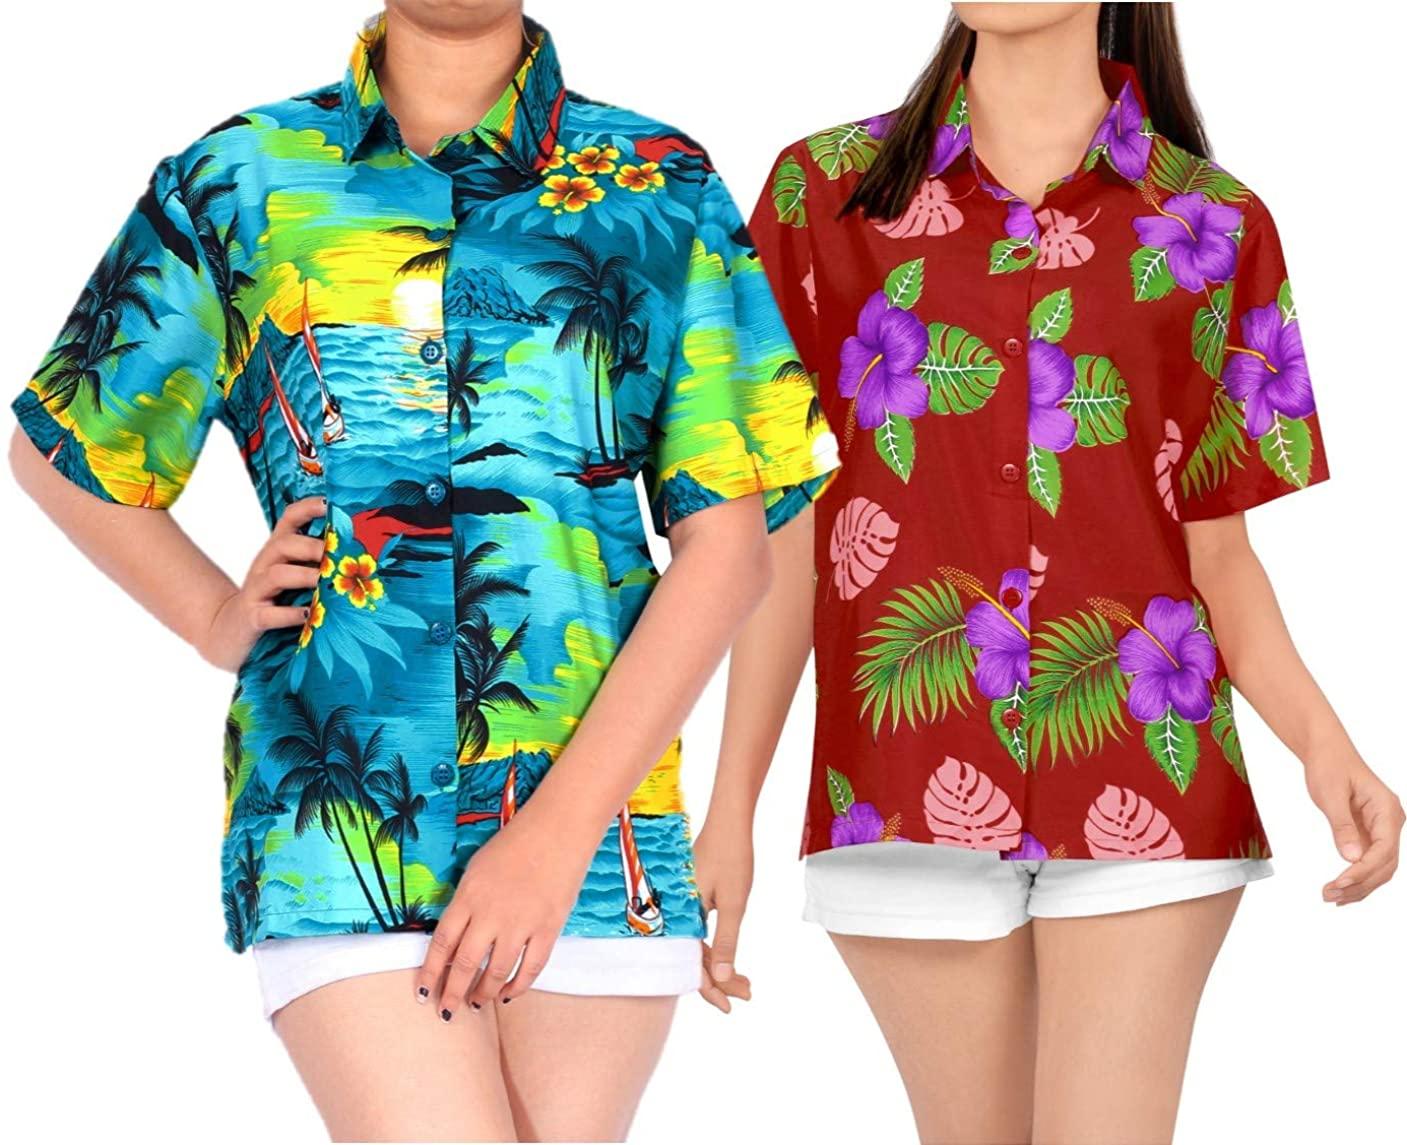 LA LEELA Women's Hawaiian Blouse Shirt Premium Casual Dress Shirt M Work from Home Clothes Women Blouse Pack of 2